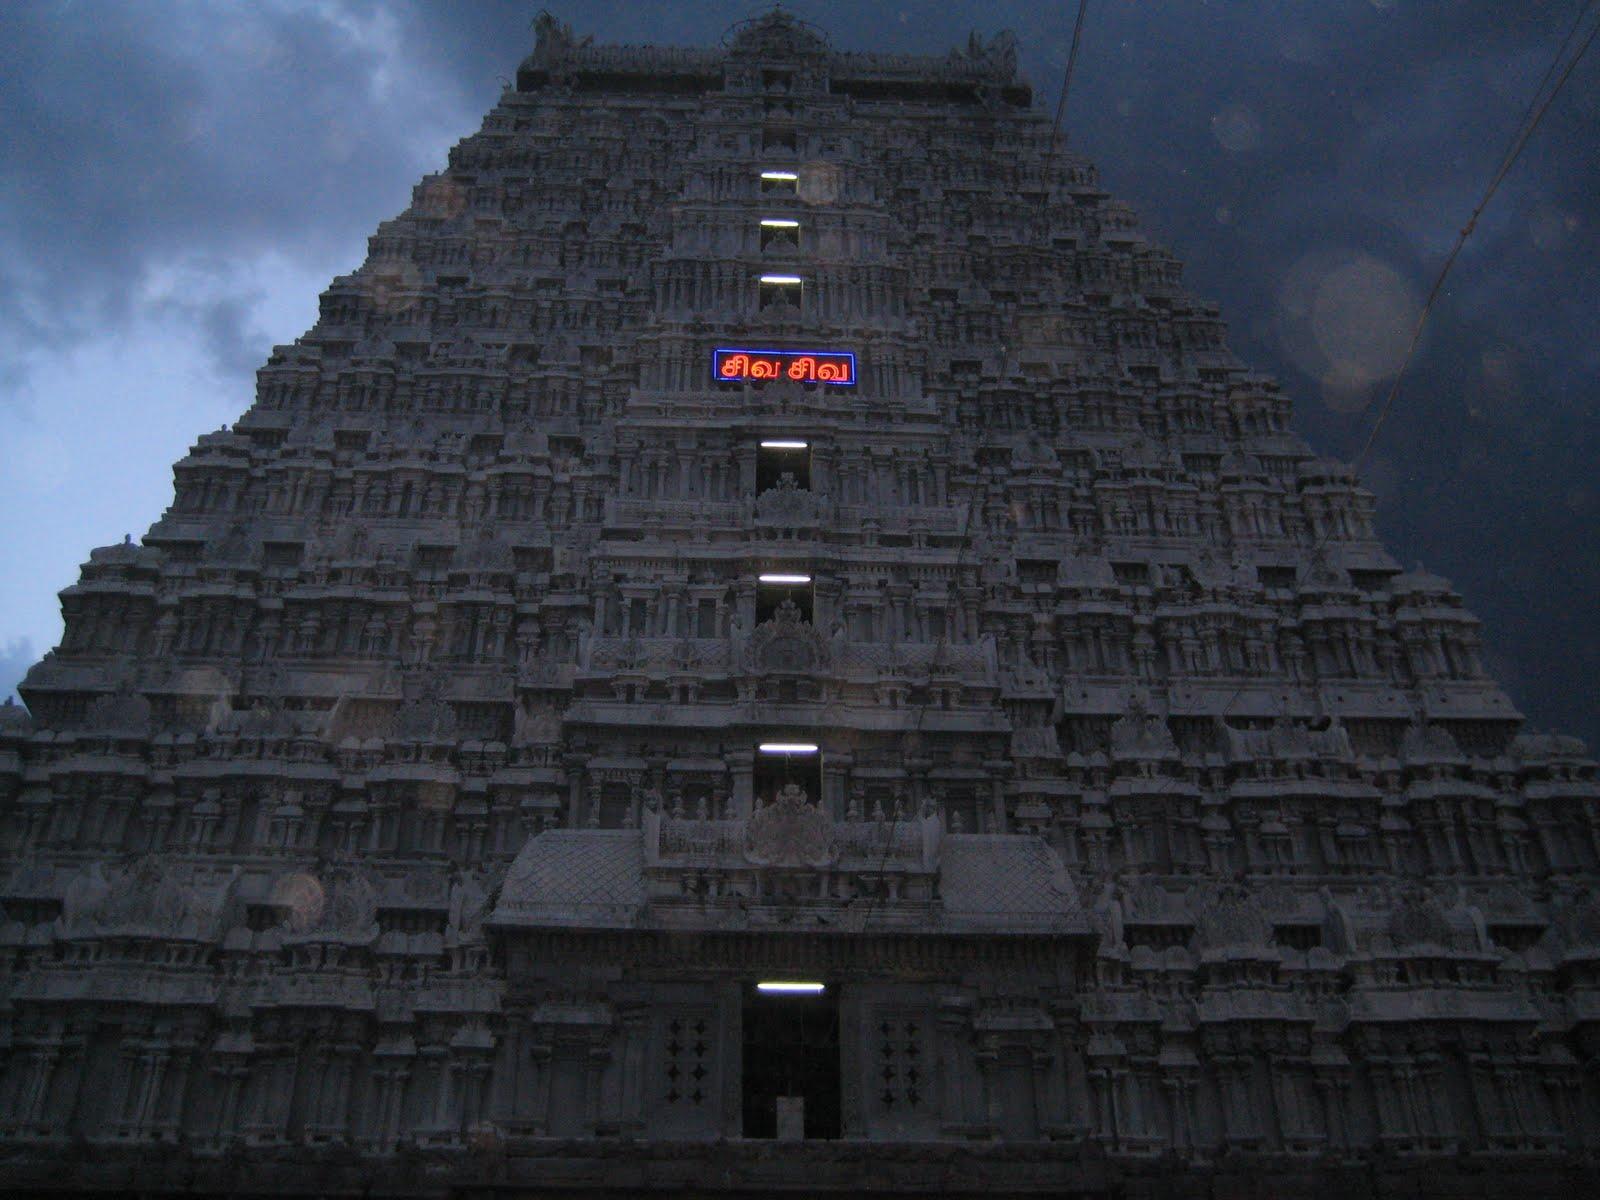 Flavours of life: Thiruvannamalai/Arunachalam  Flavours of lif...